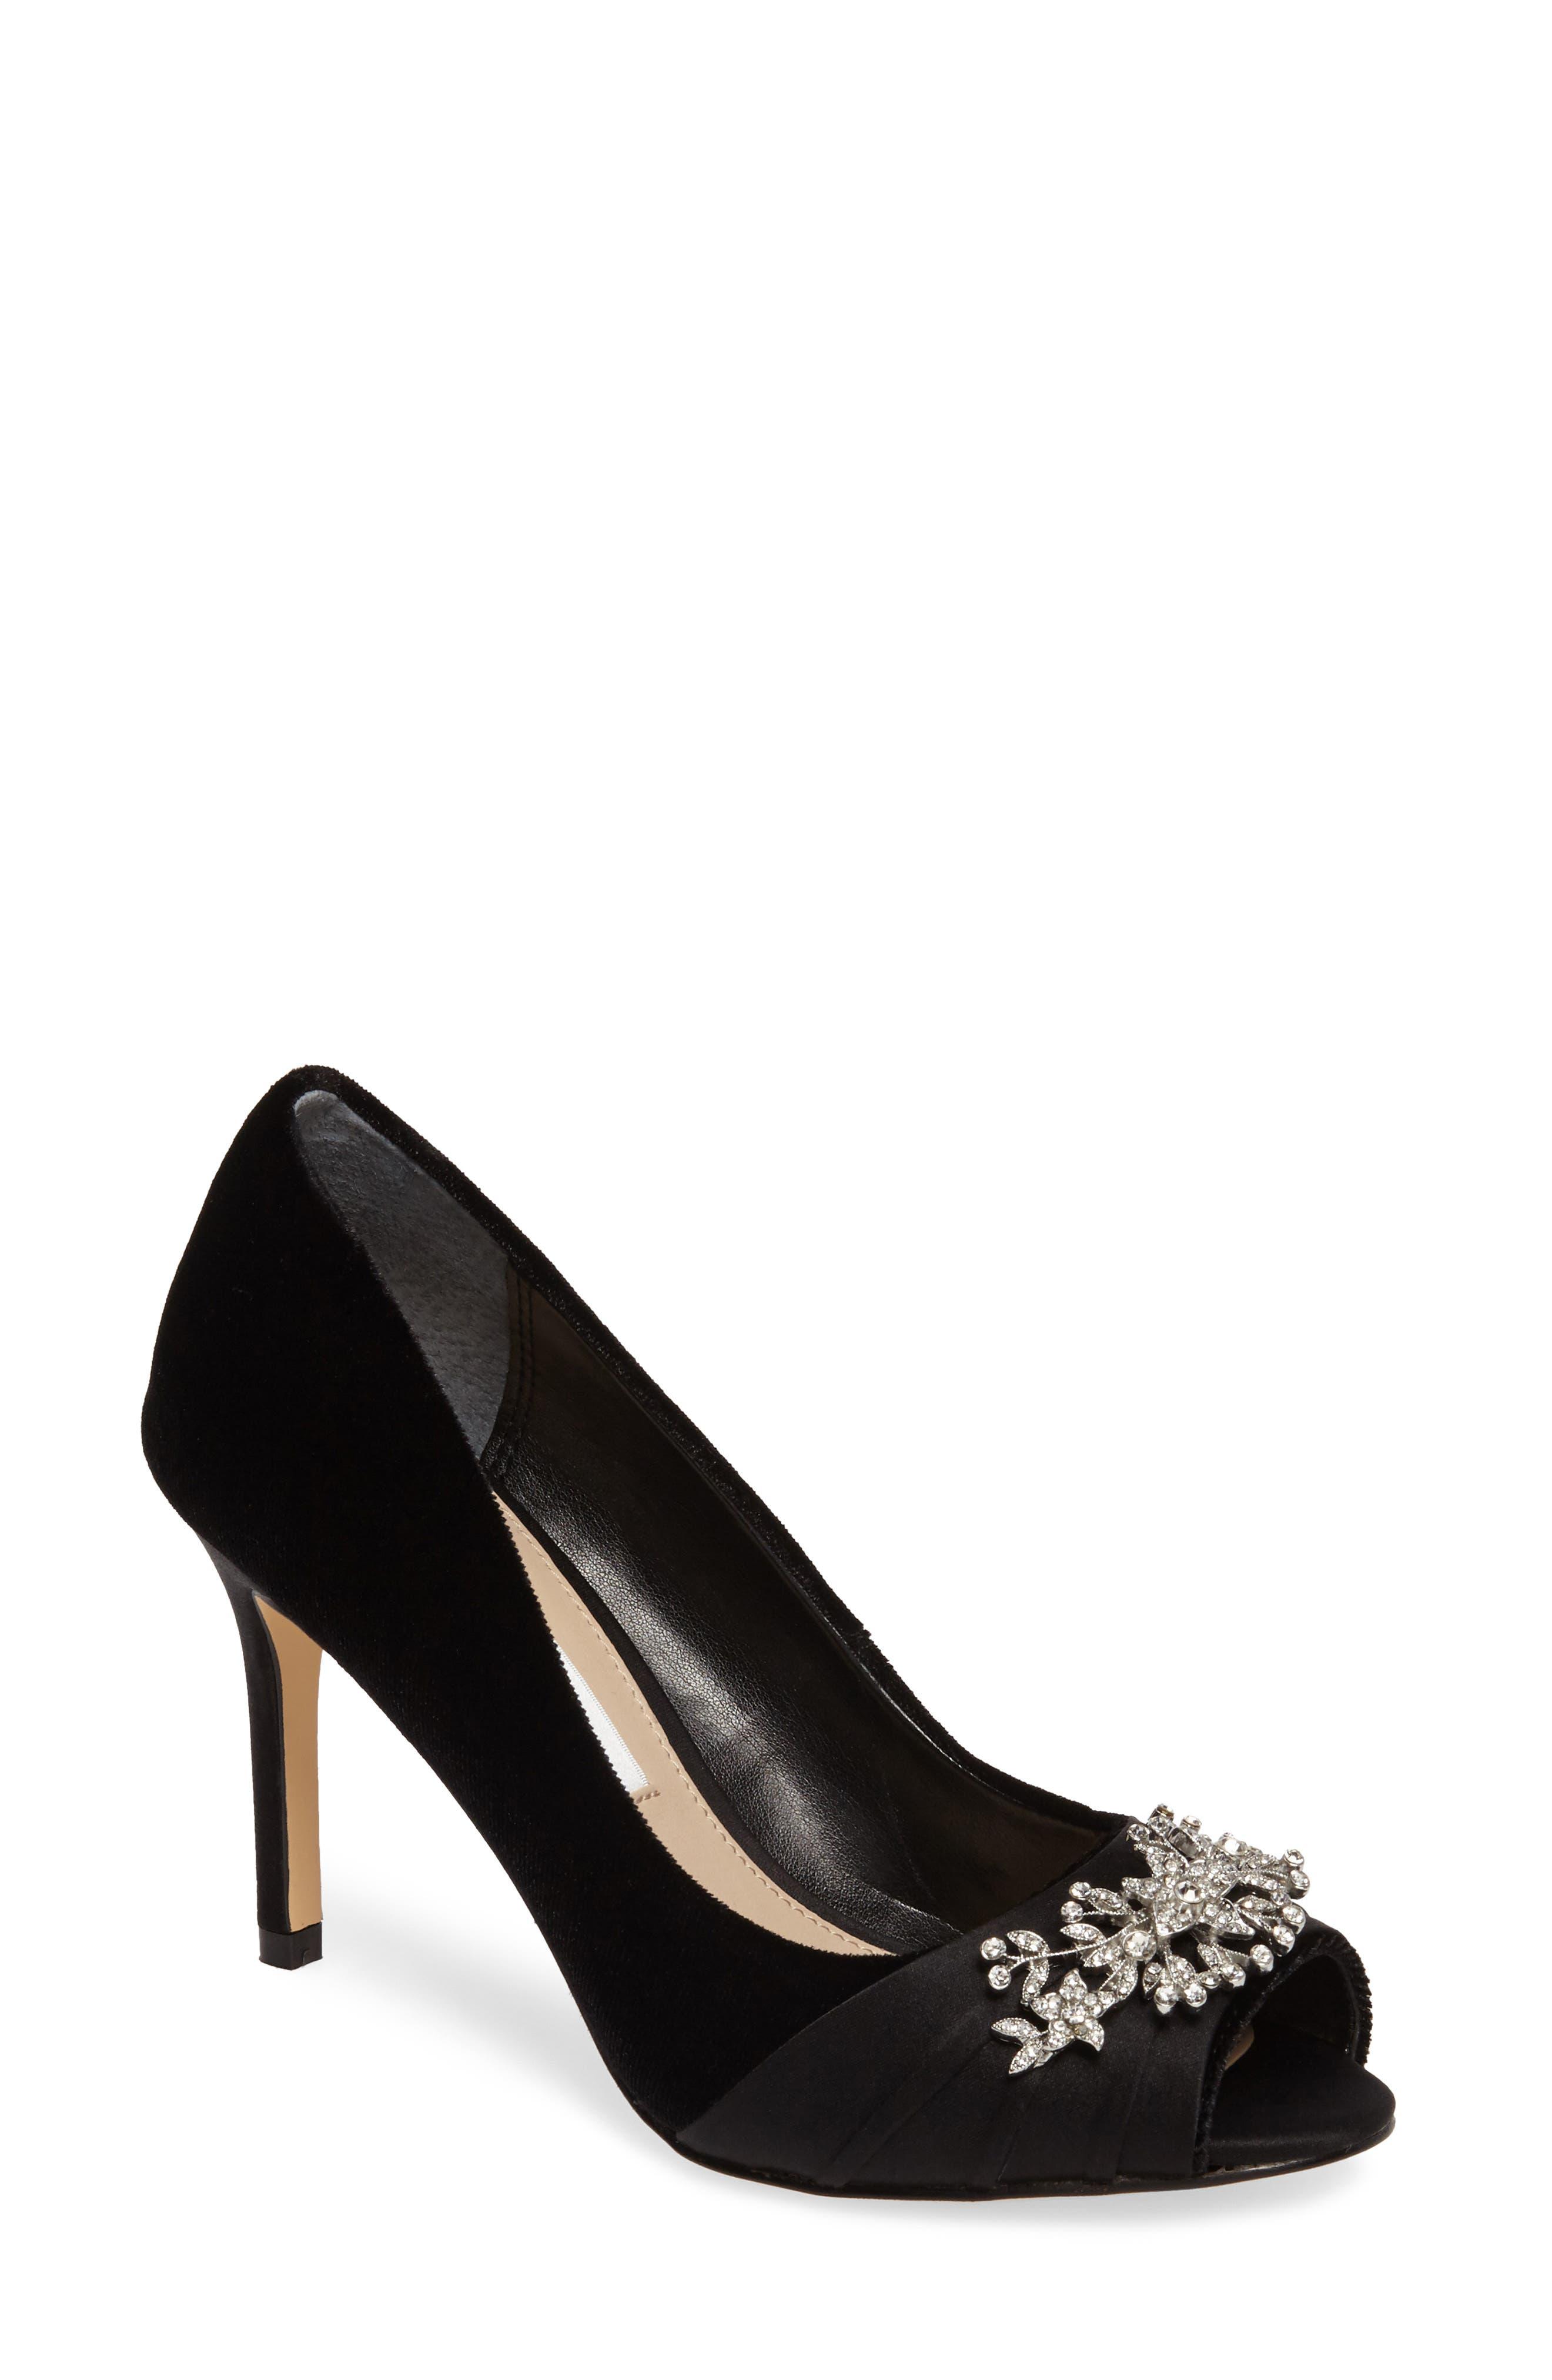 Rumina Embellished Peep Toe Pump,                         Main,                         color, Black Velvet